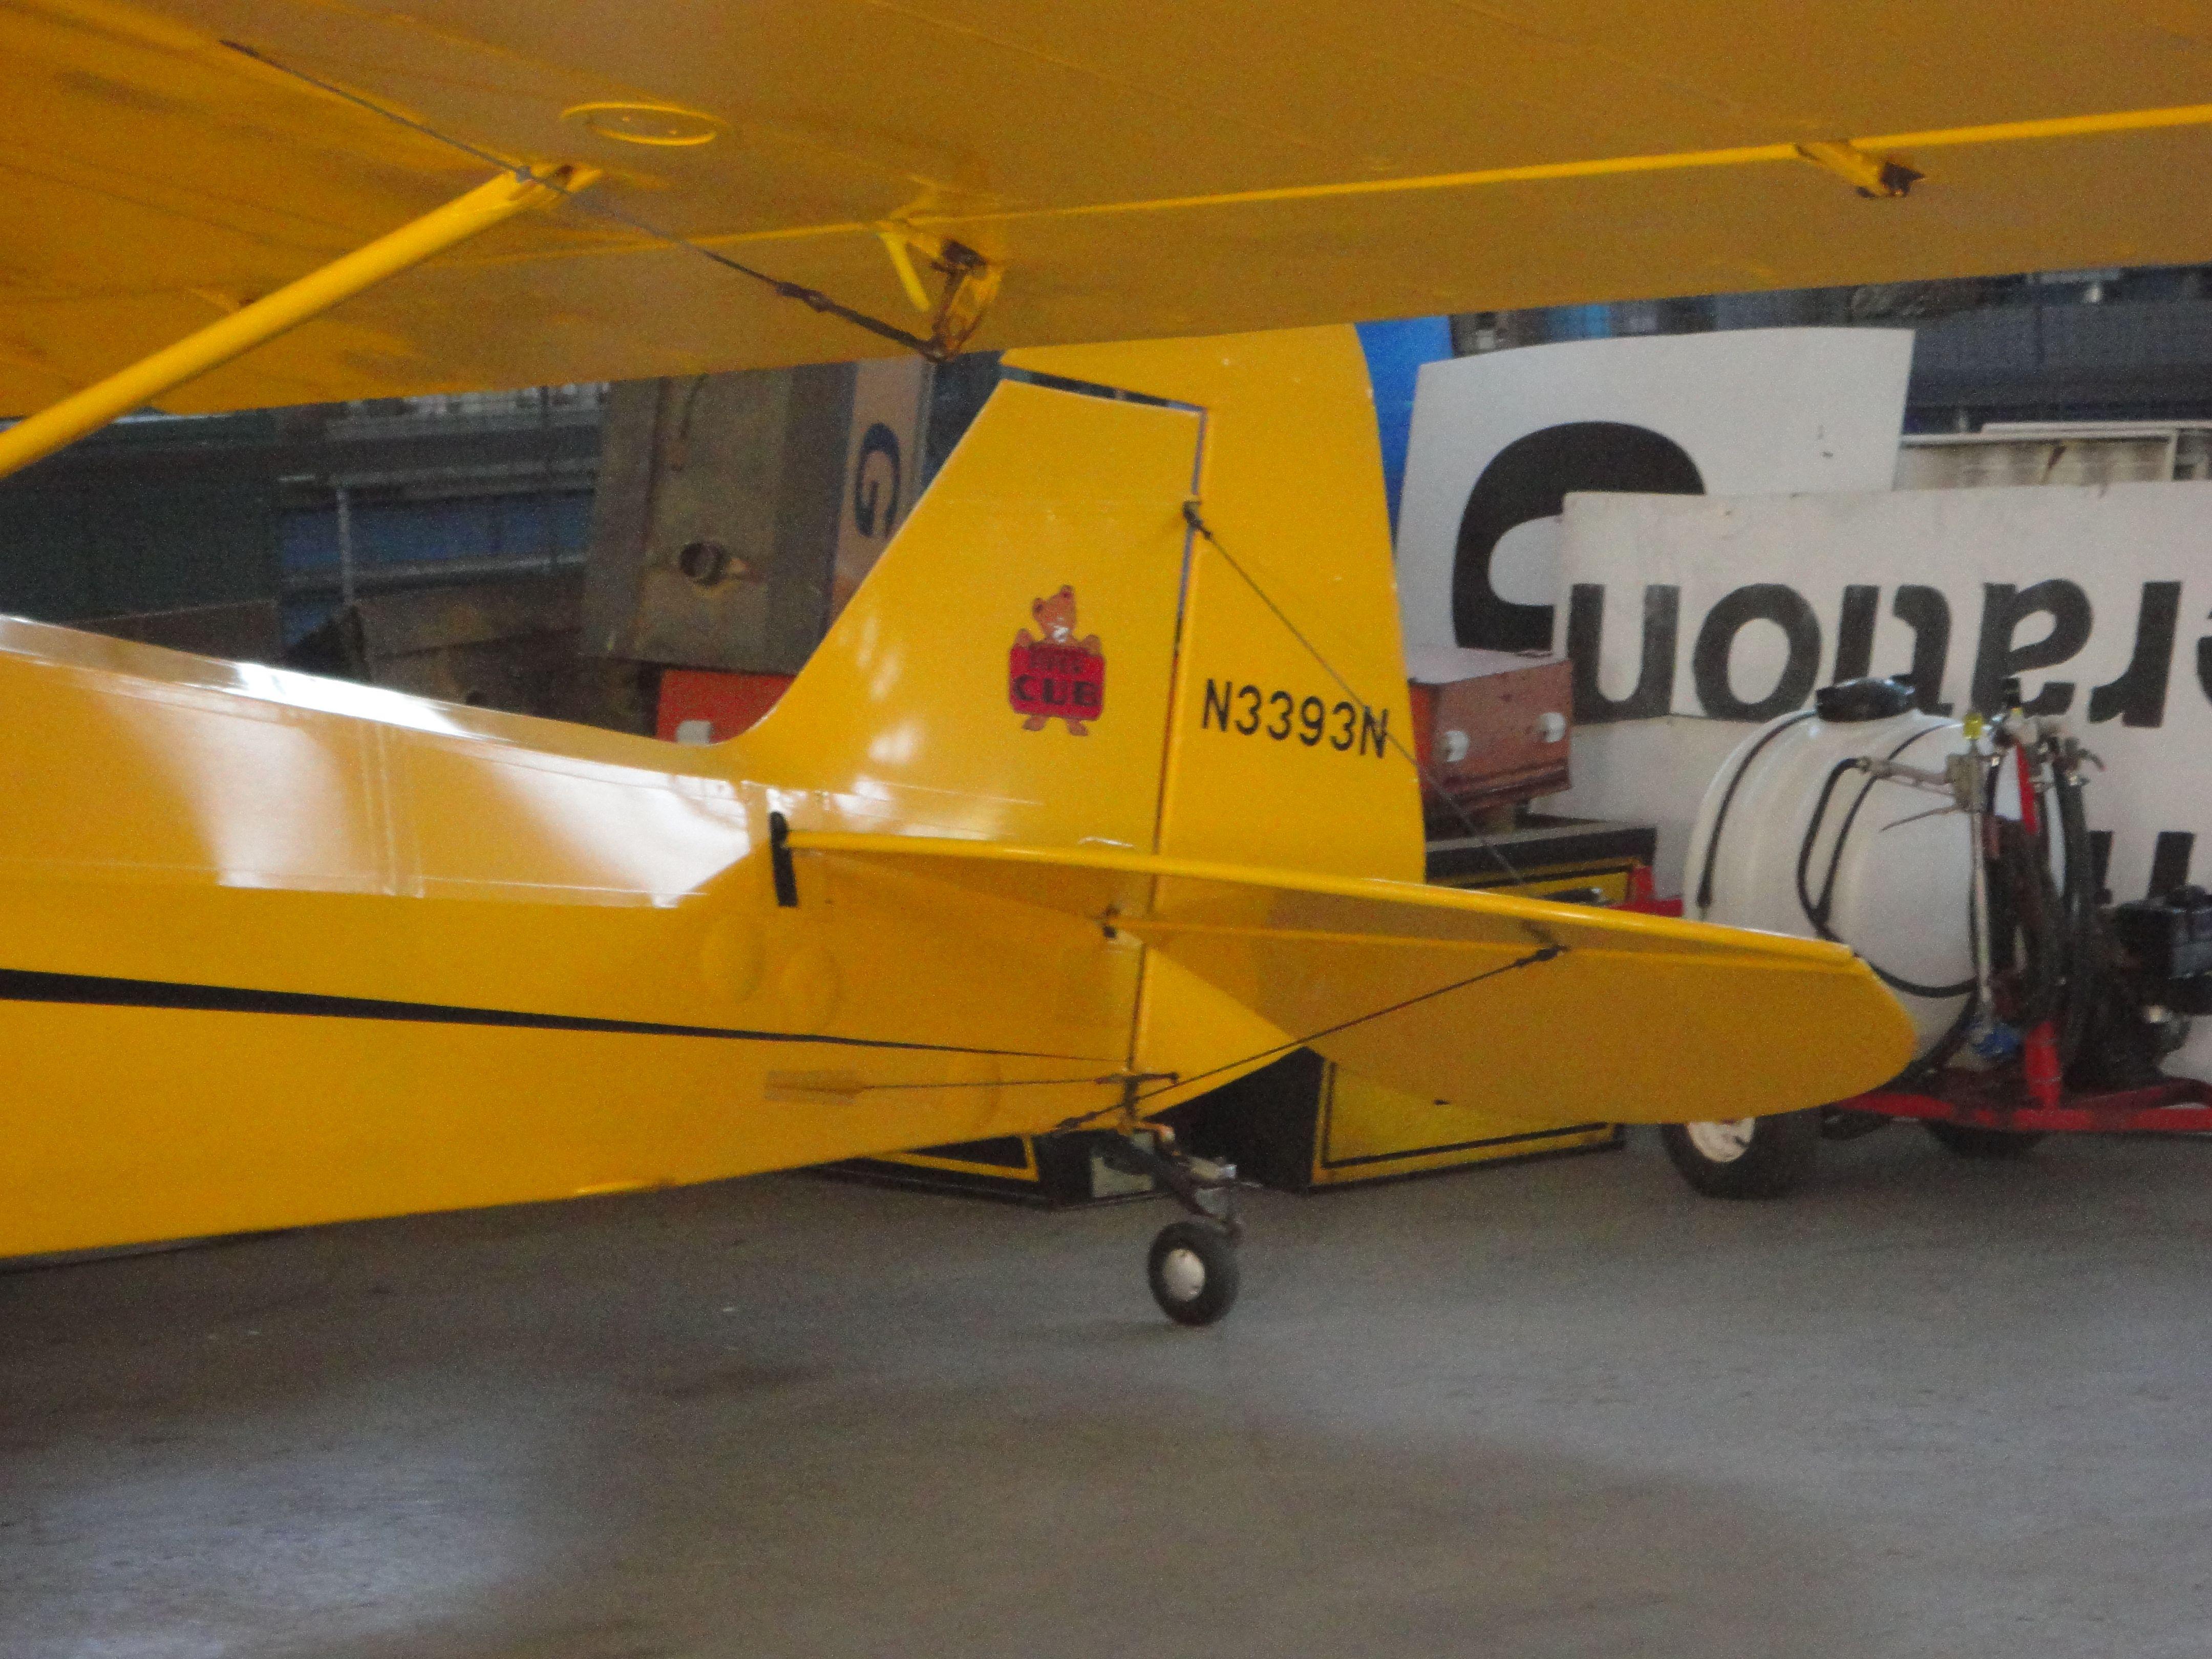 Piper cub j3 has the symbol of the piper cub on the back wing piper cub j3 has the symbol of the piper cub on the back wing buycottarizona Gallery